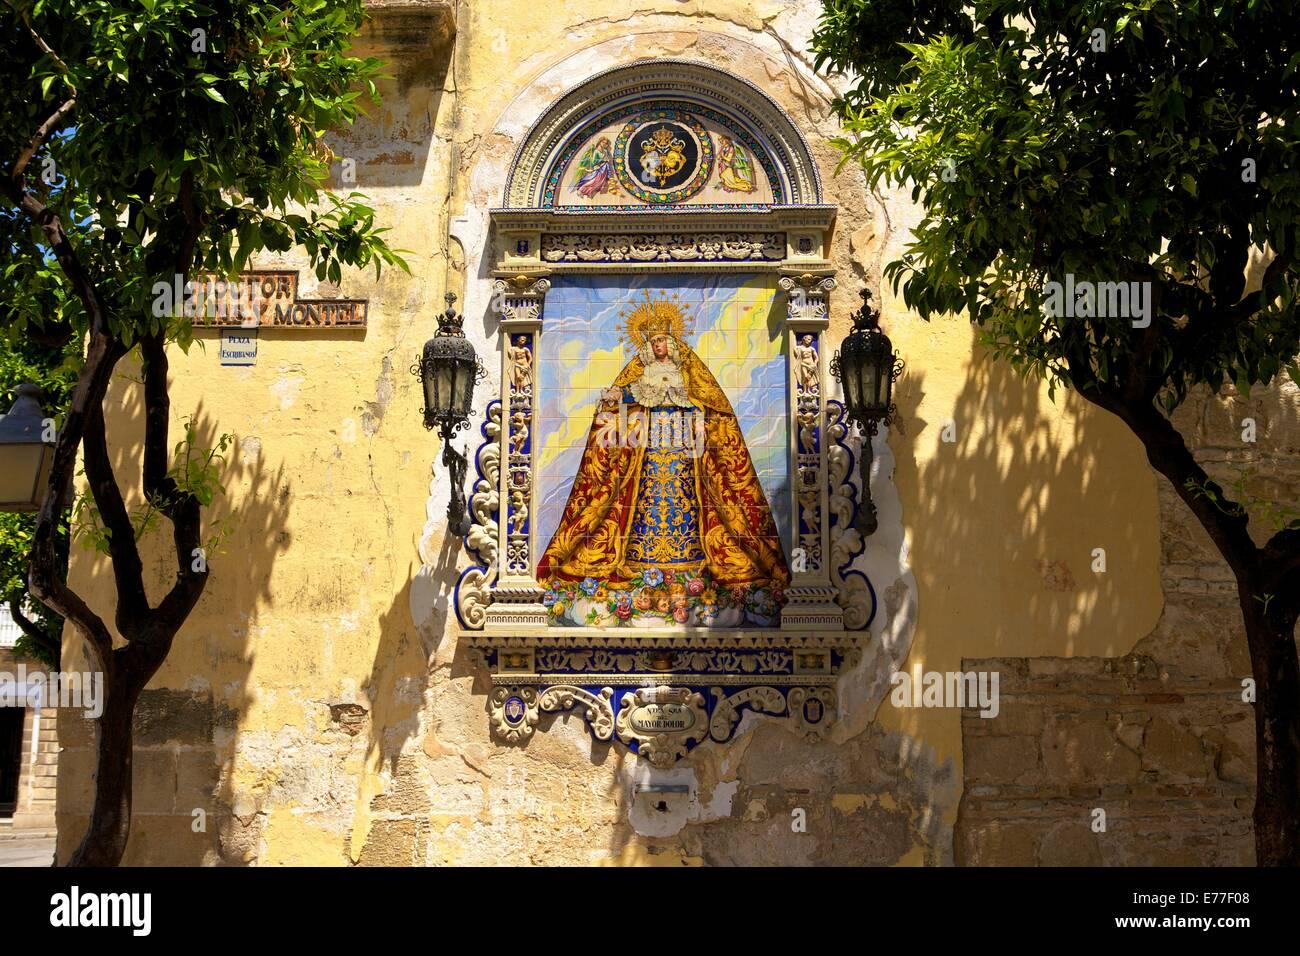 Provinz keramische Wandbild, Jerez De La Frontera, Cádiz, Andalusien, Spanien, Süd-West-Europa Stockbild